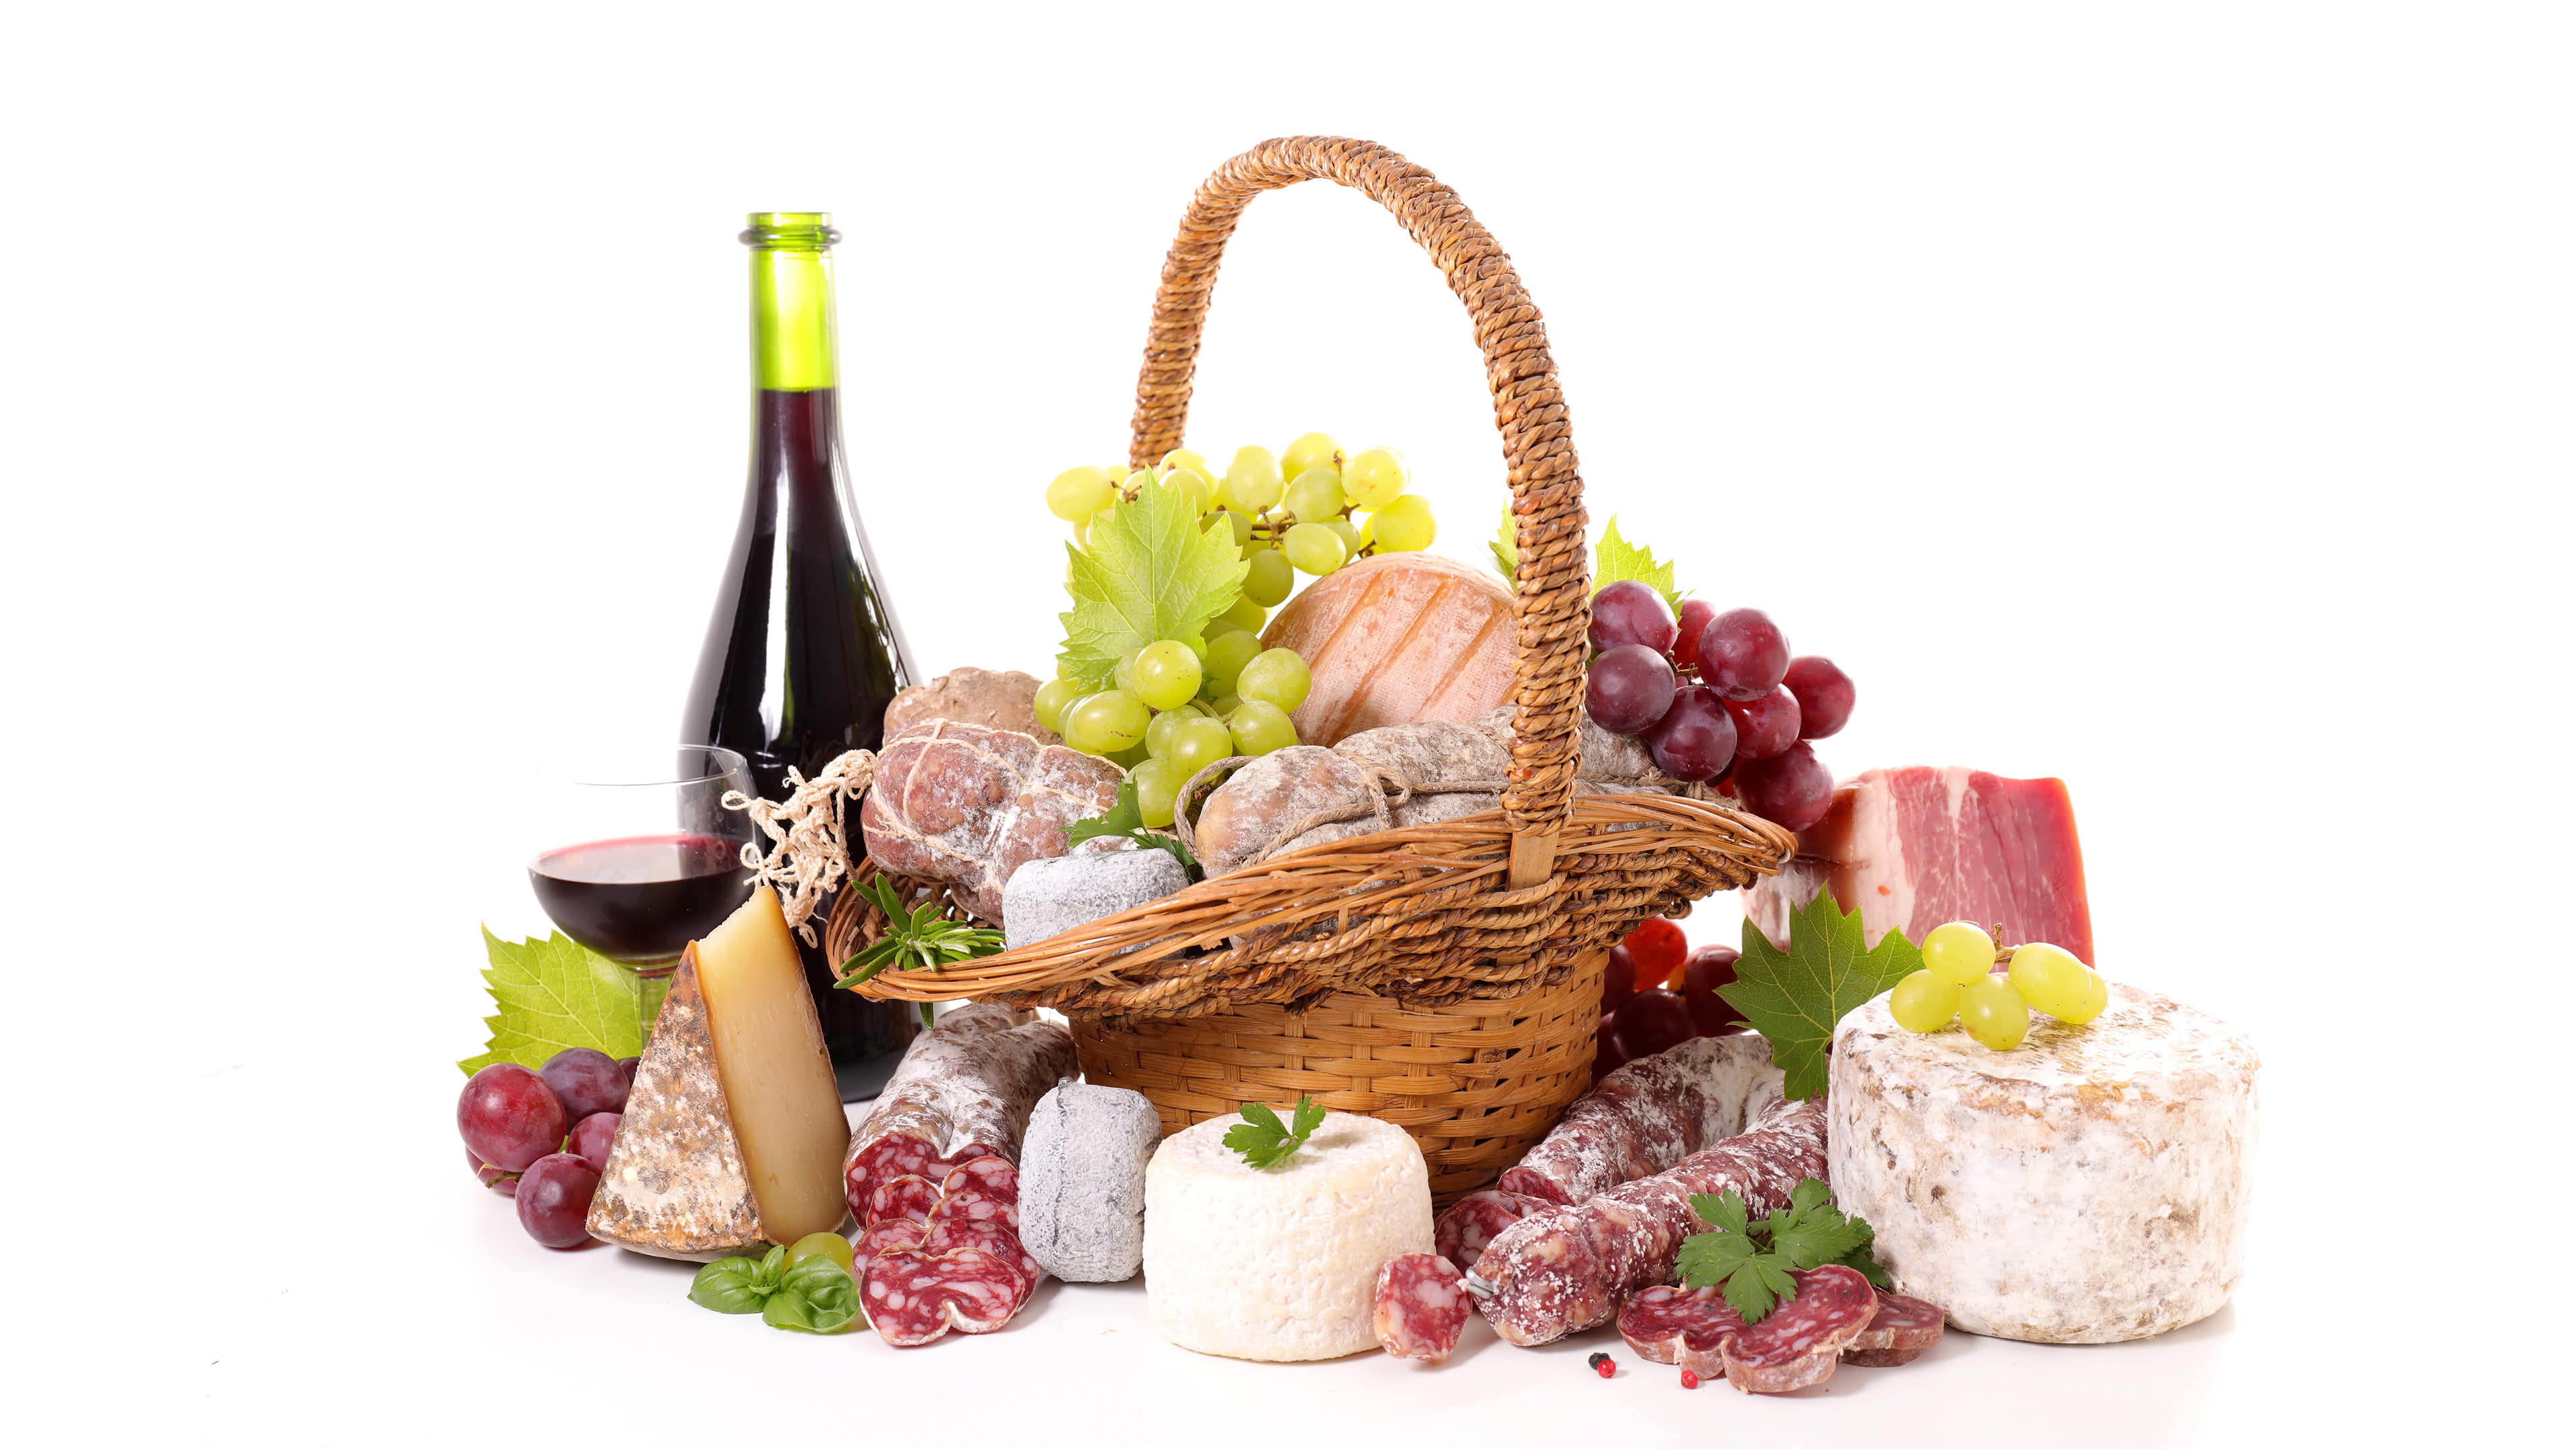 sausage cheese and wine basket uhd 4k wallpaper